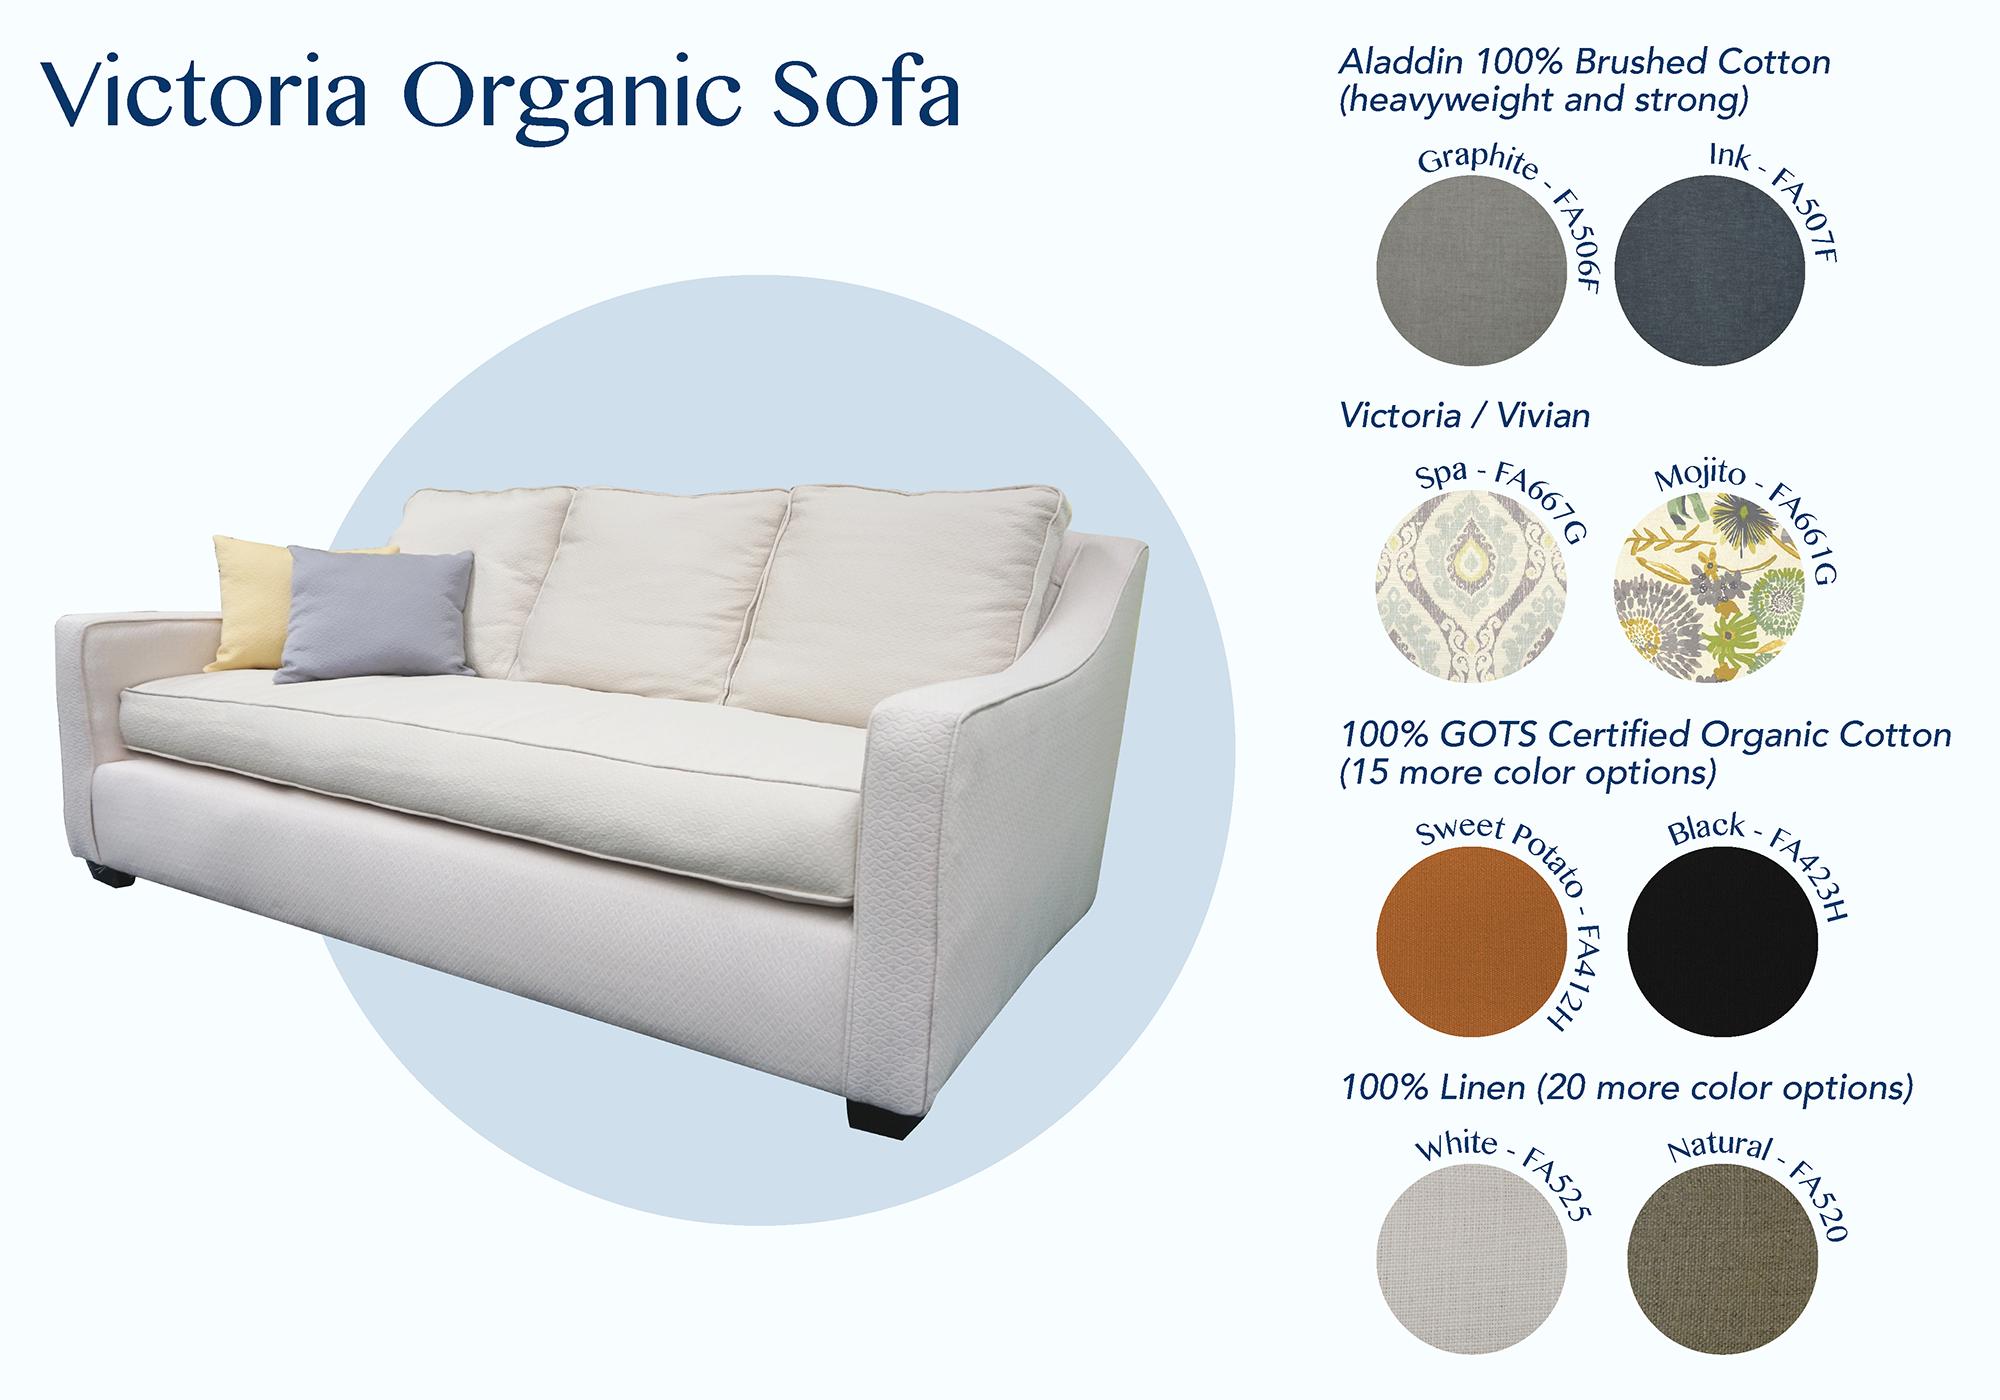 Enjoyable Organic Sofa Victoria The Perfect Family Living Area Spiritservingveterans Wood Chair Design Ideas Spiritservingveteransorg